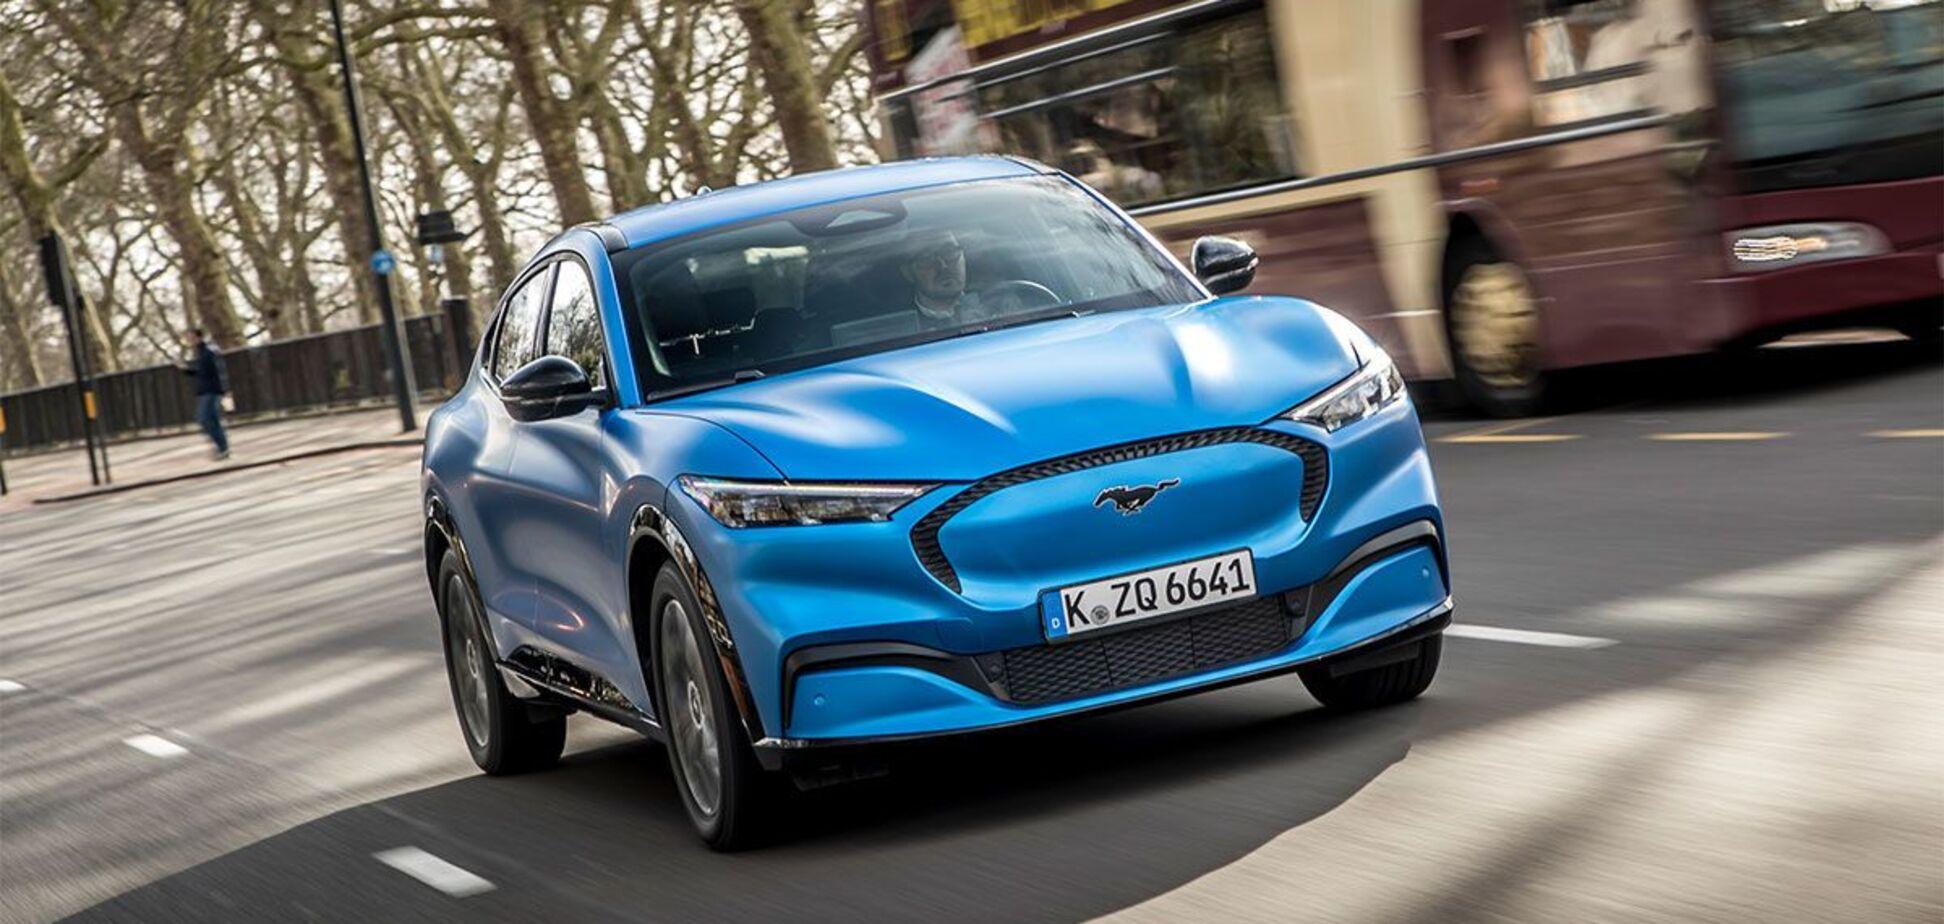 Ford анонсировал доступный электрокар за $20 000